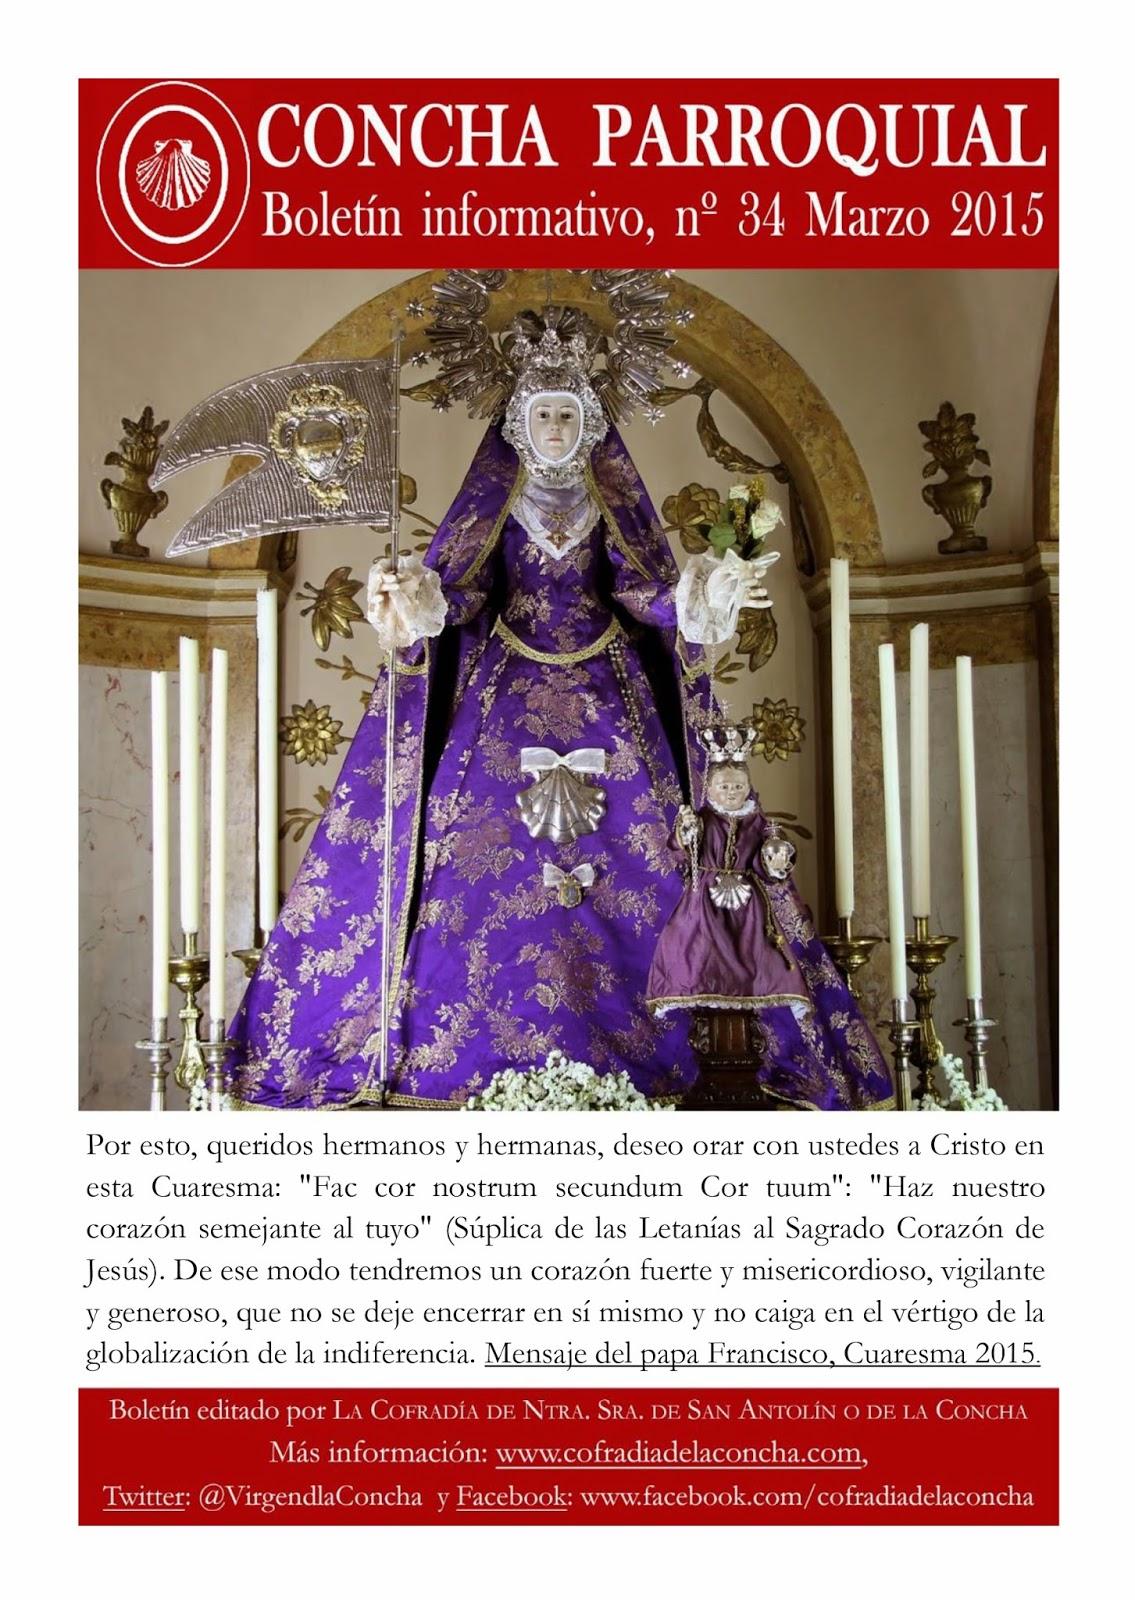 http://www.cofradiadelaconcha.com/boletines/2015/marzo2015.pdf